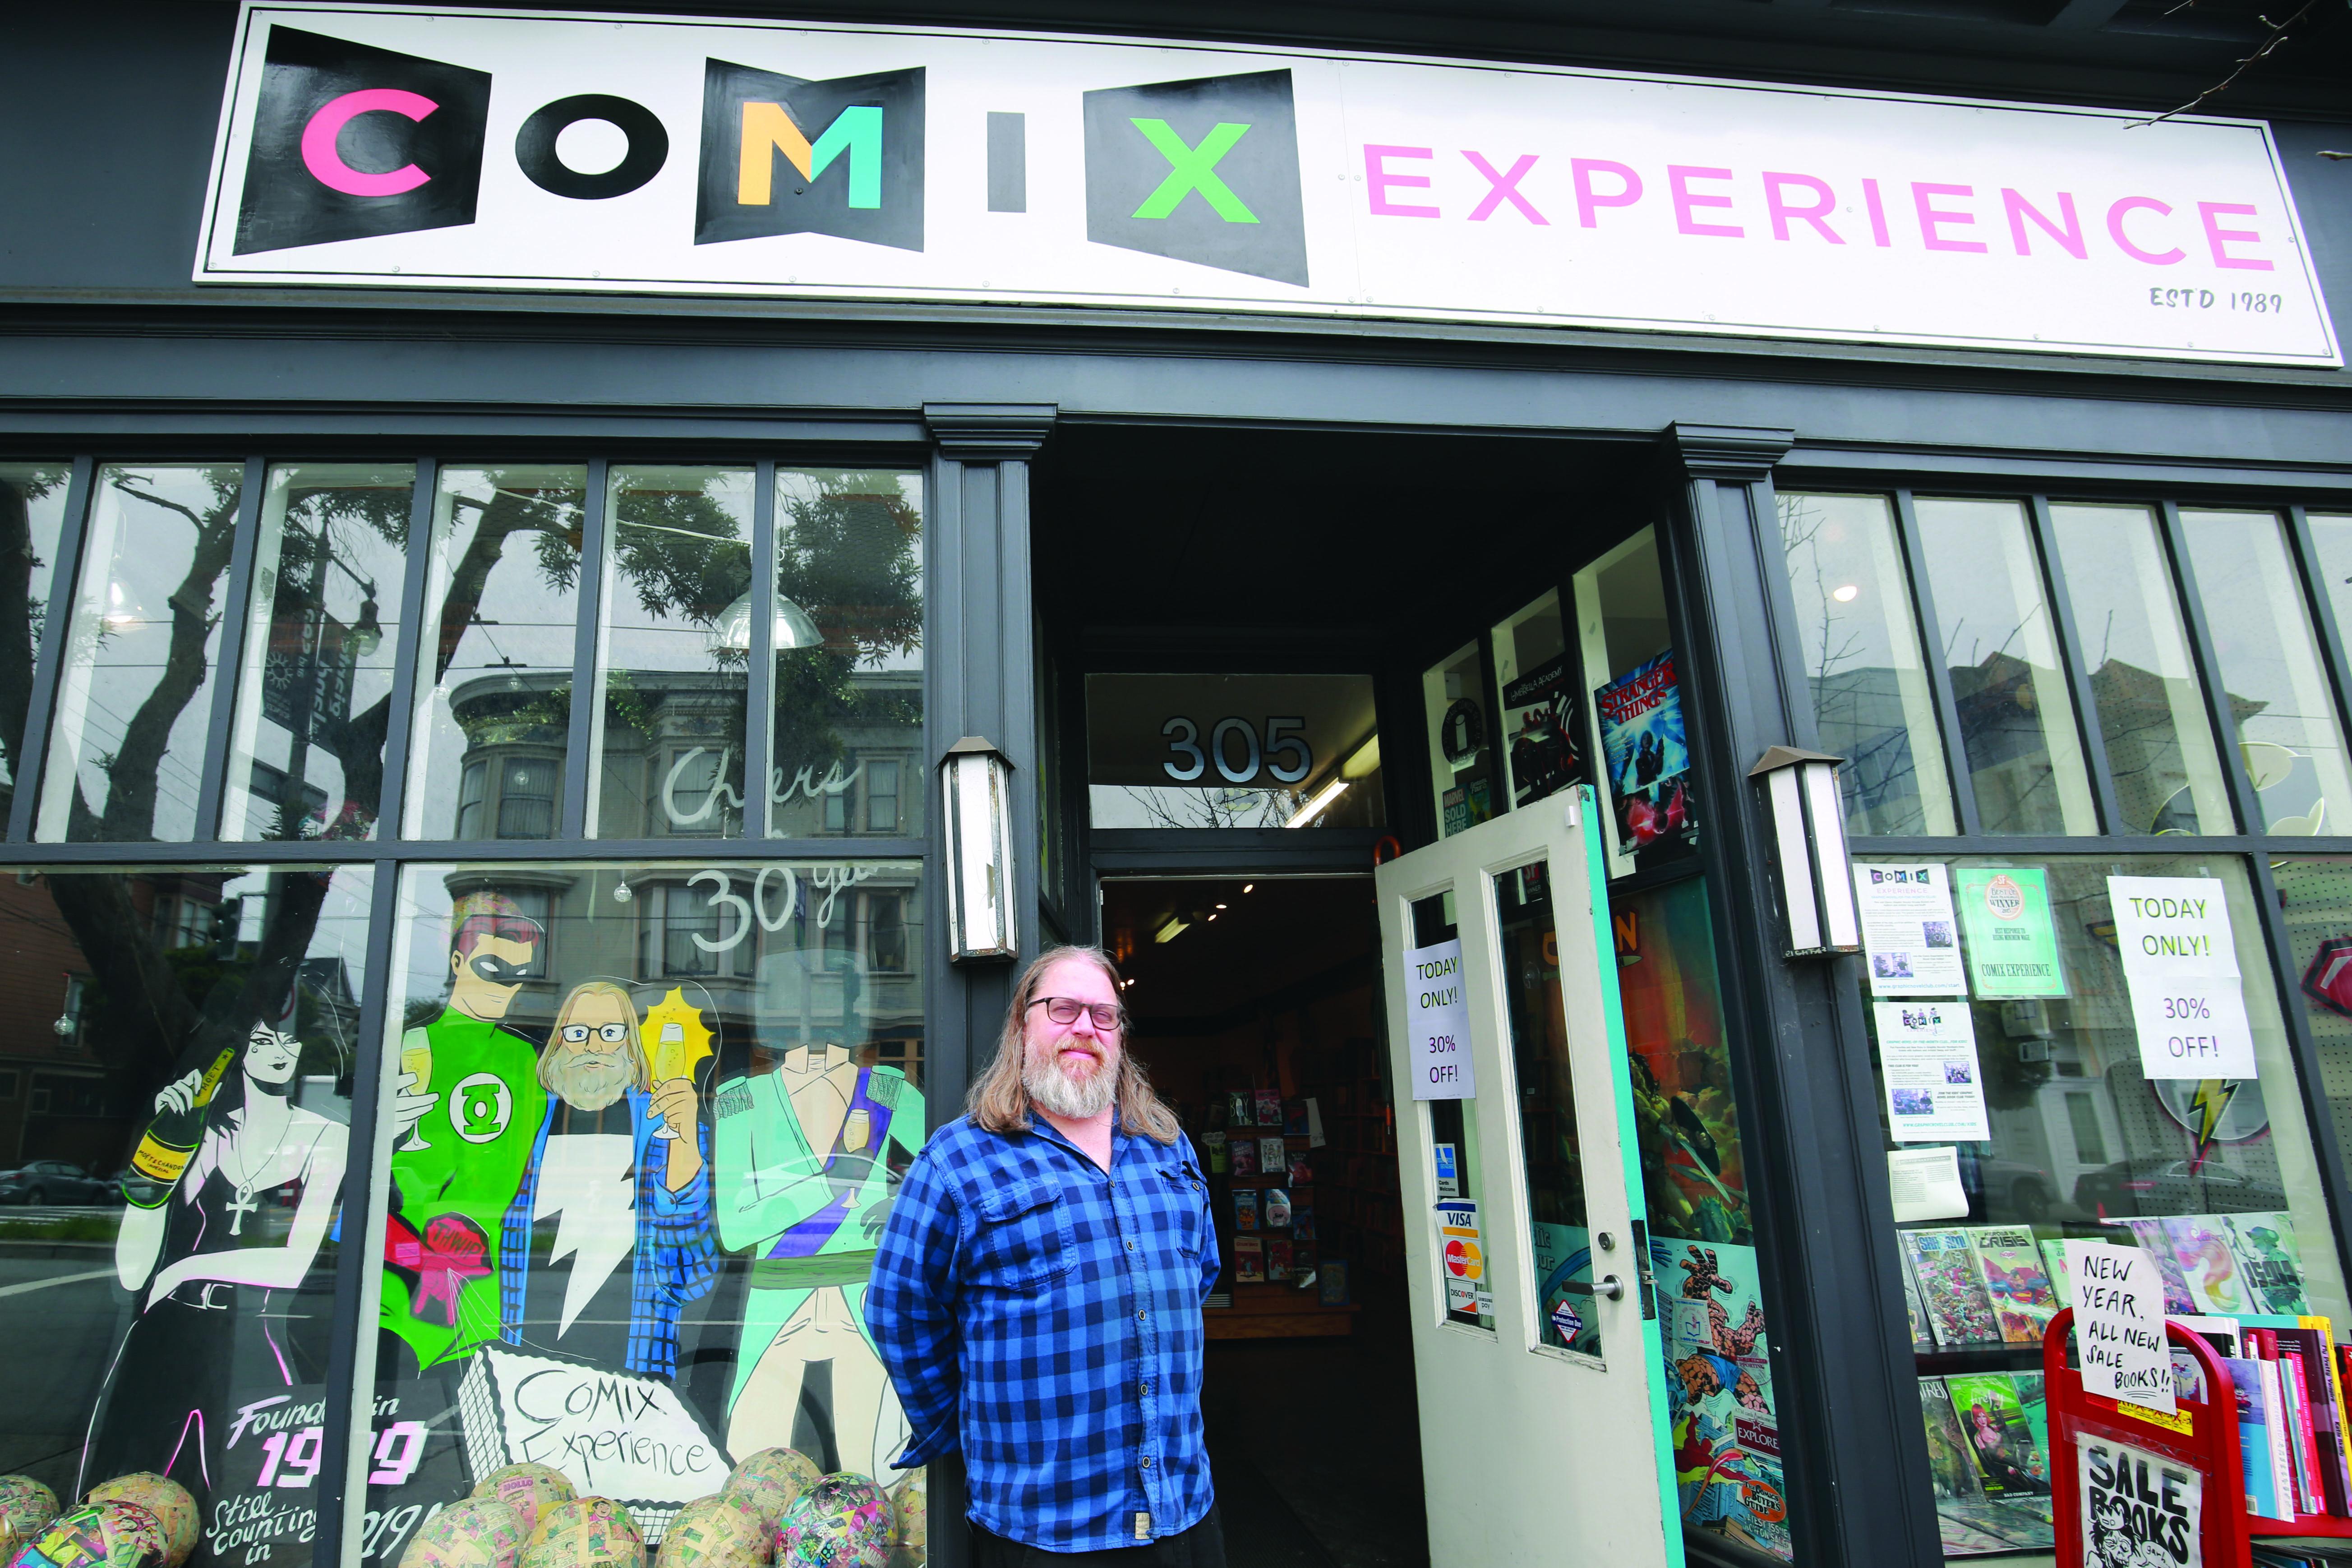 Comix Experience celebrates 30th Anniversary